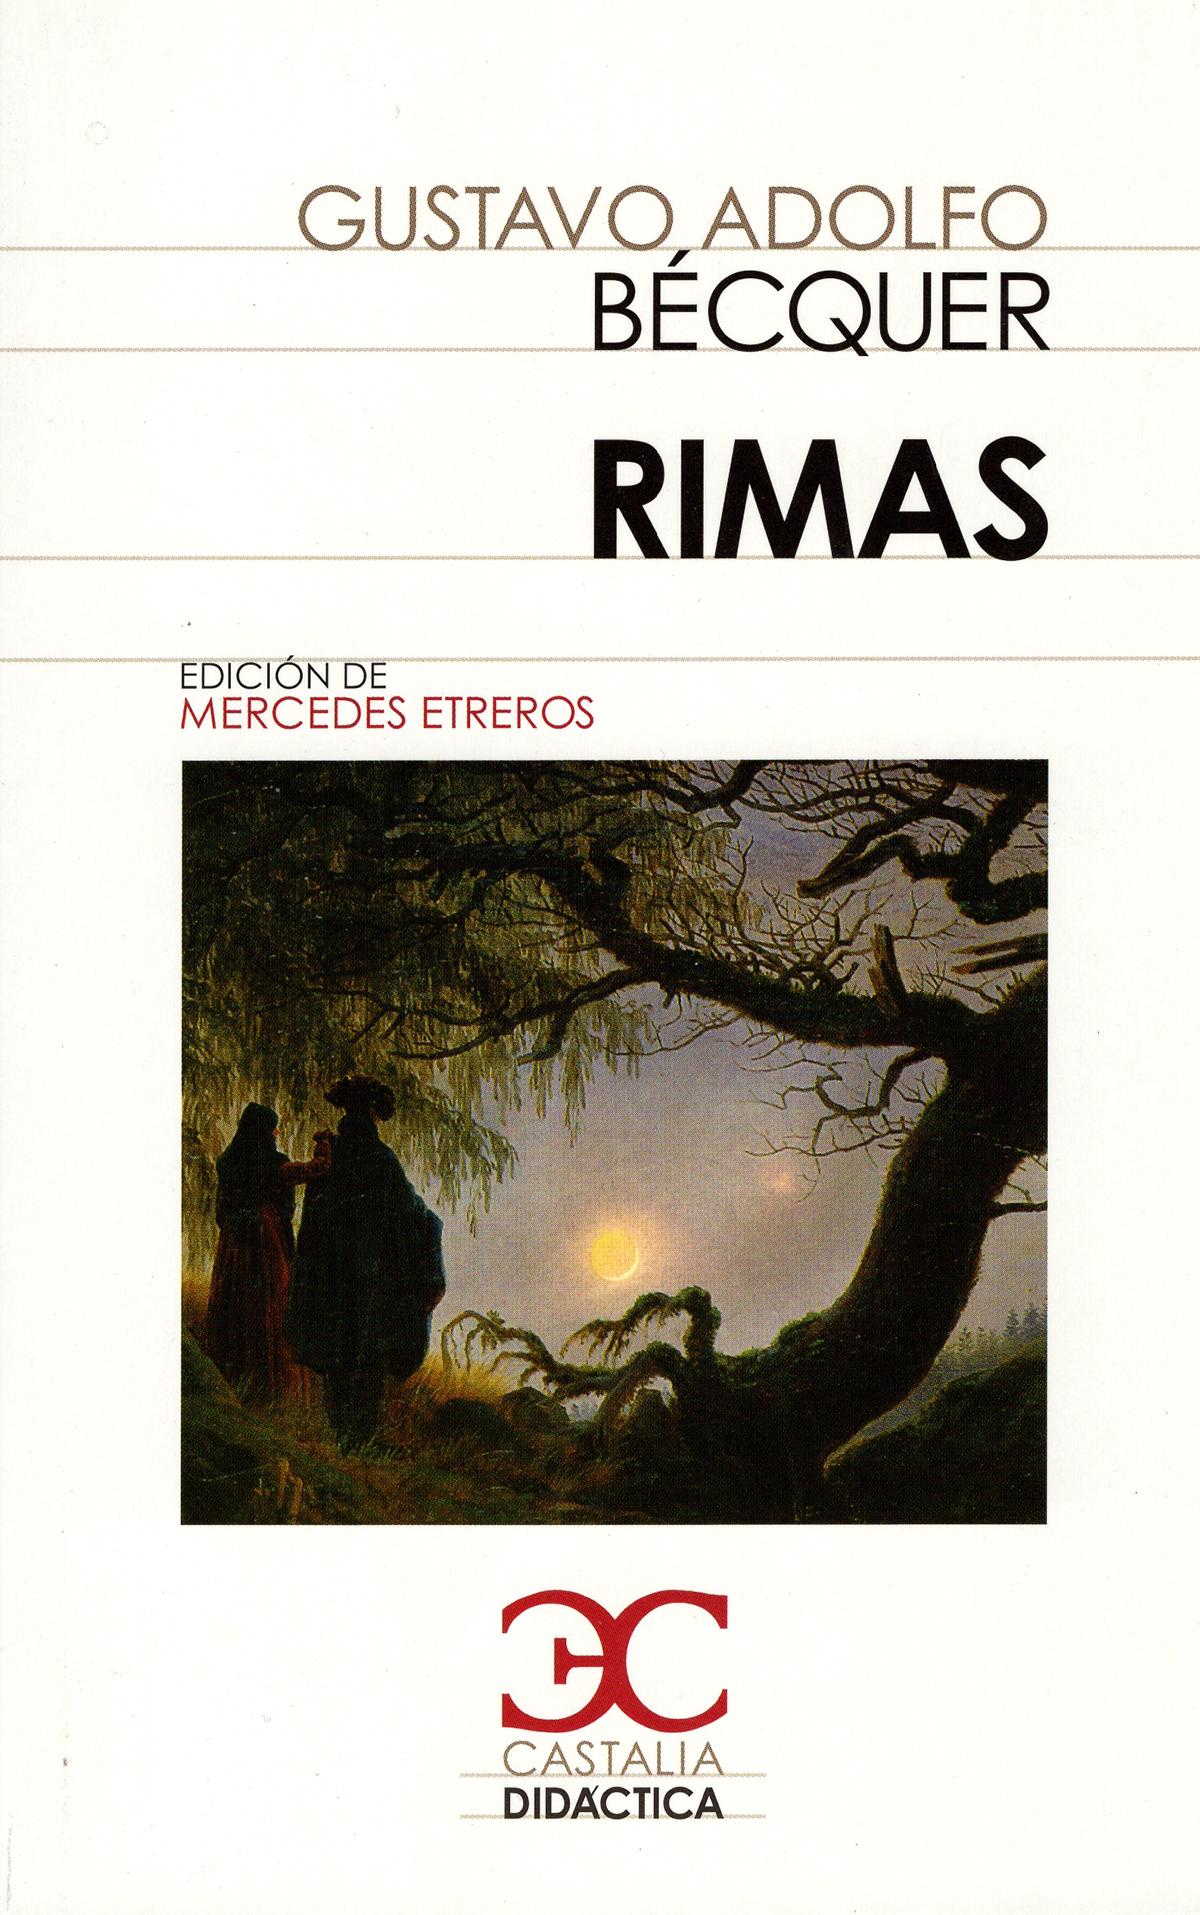 Rimas (Gustavo Adolfo Becquer)